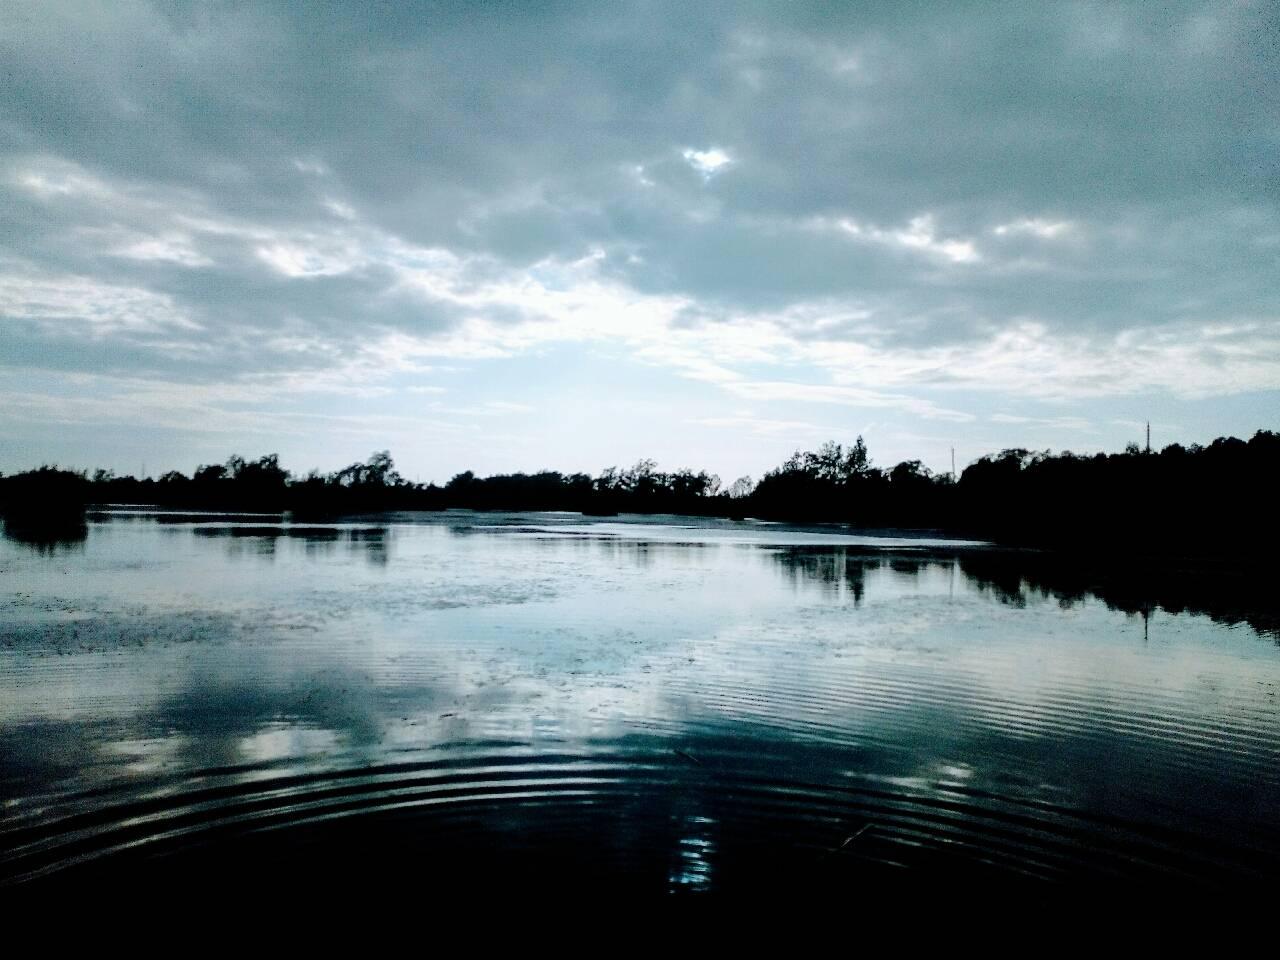 озеро вечір foto Oleg